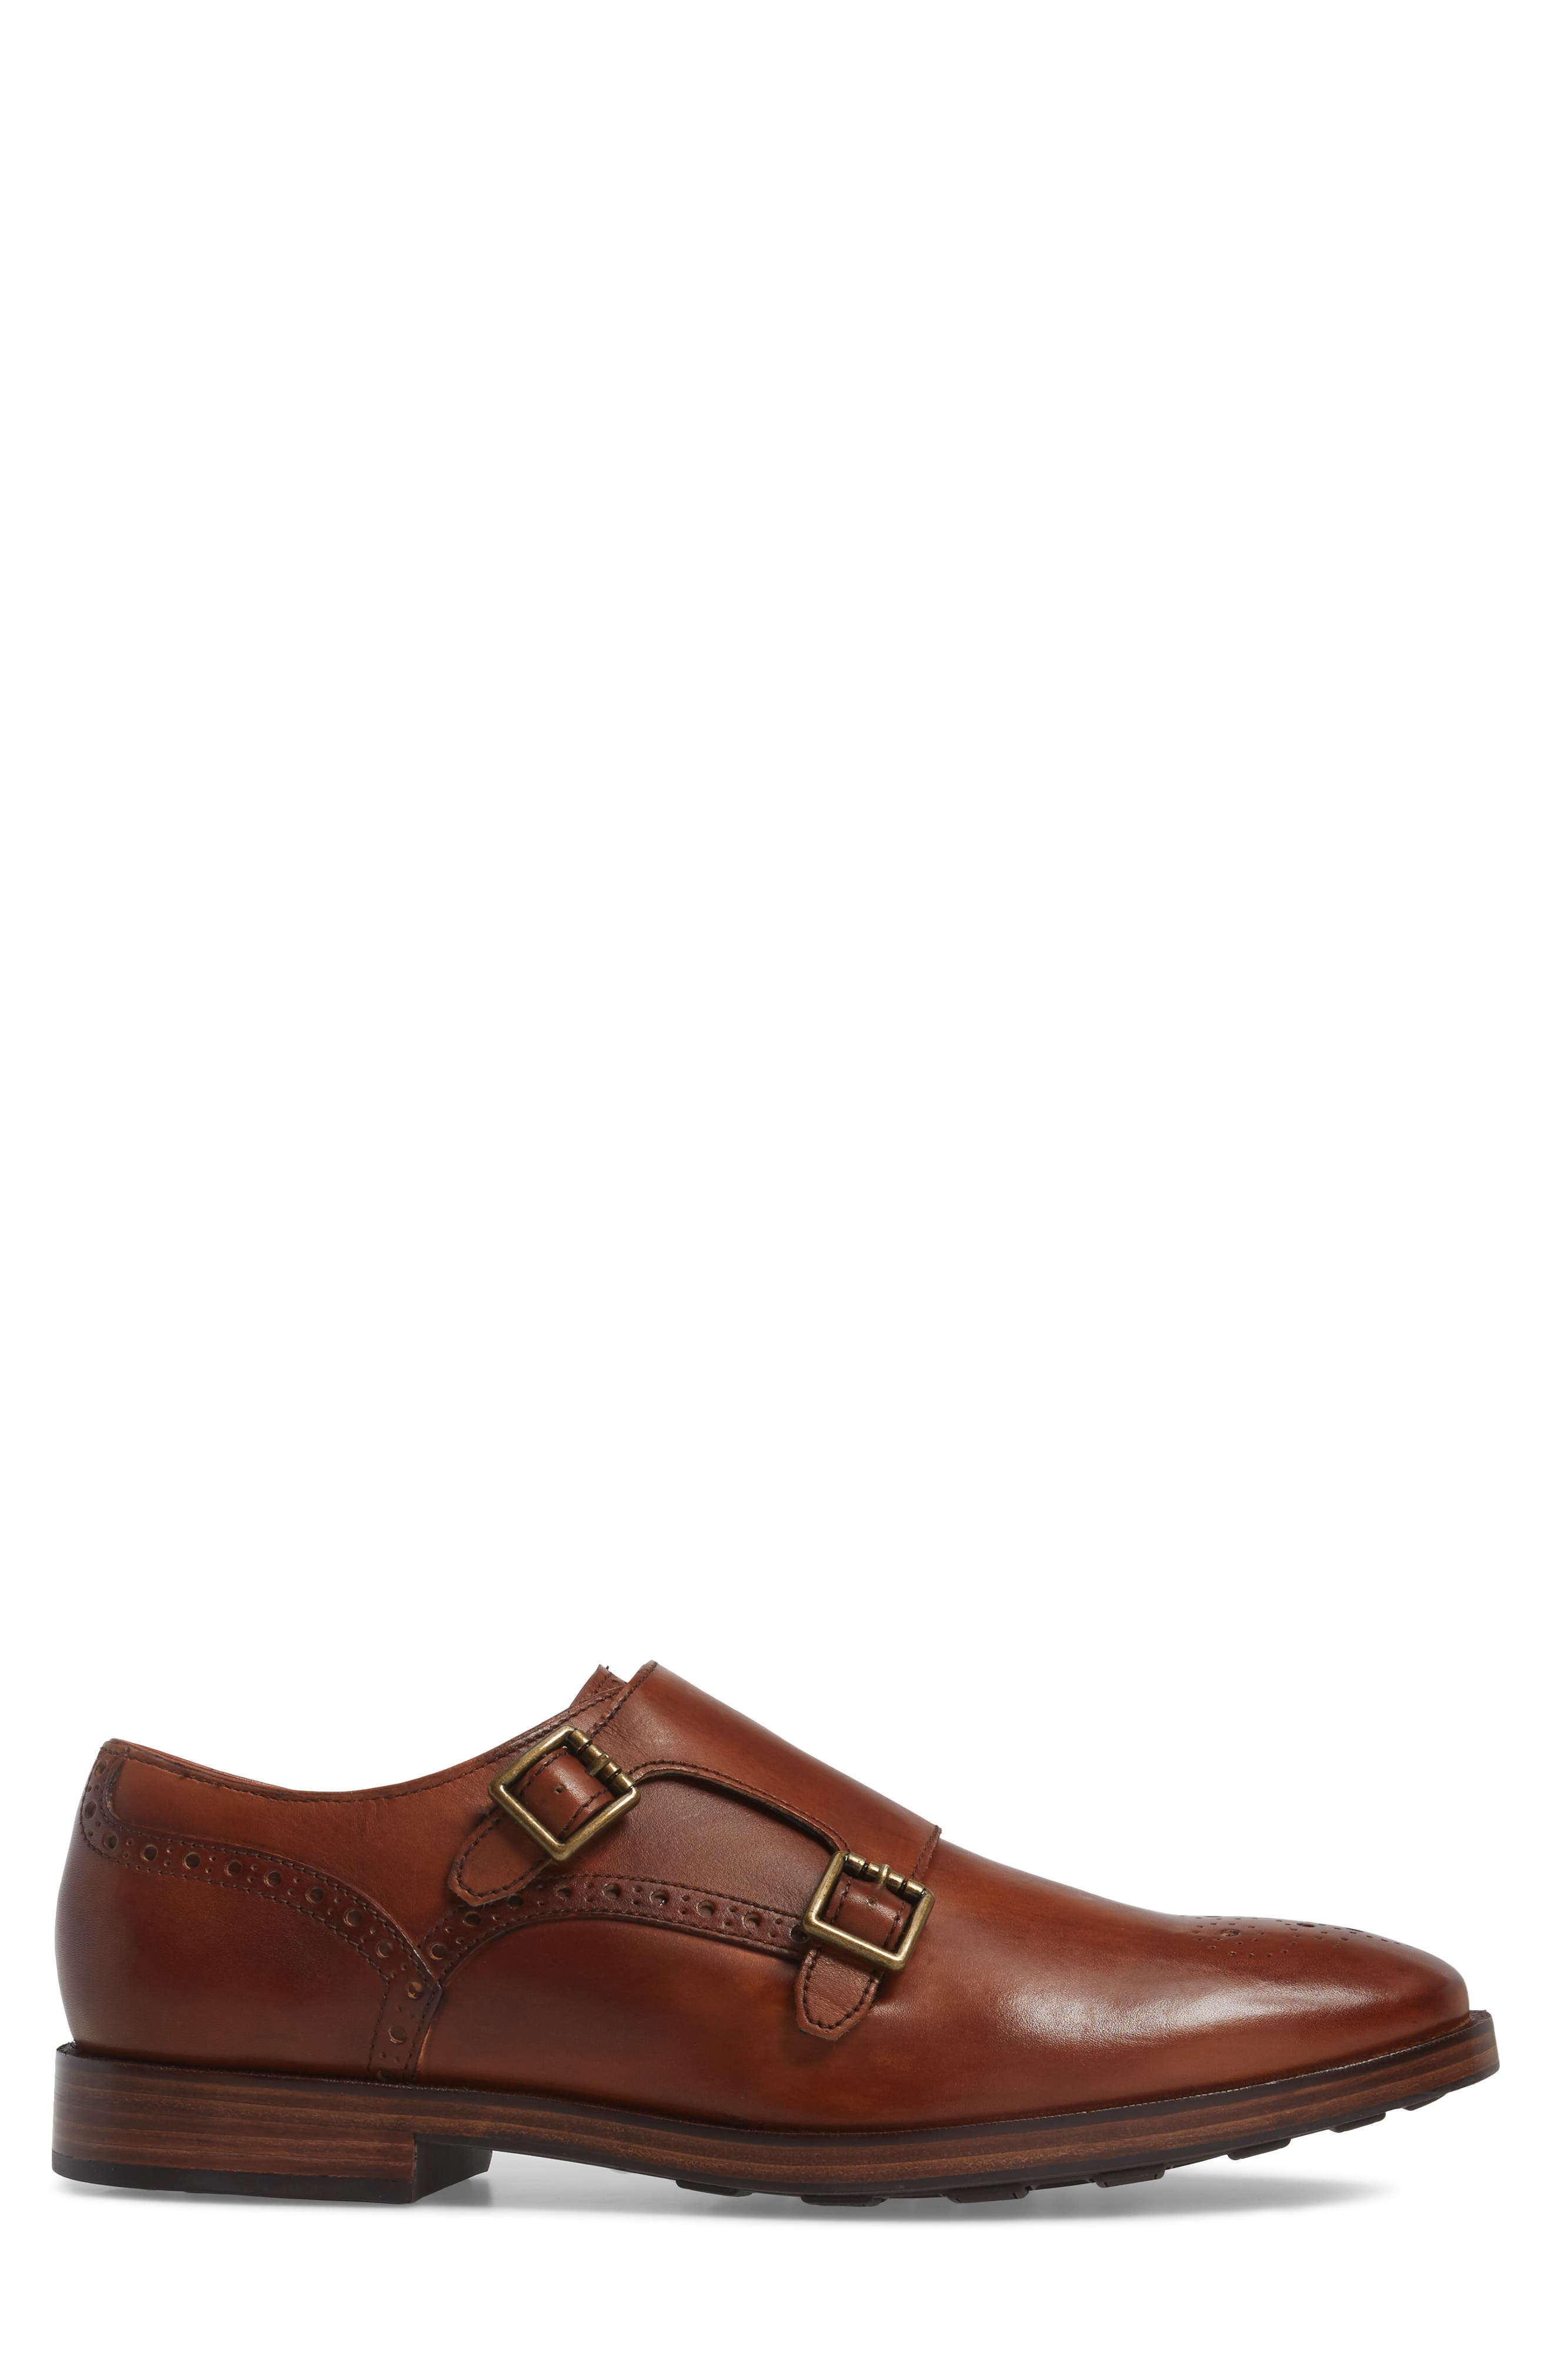 Hamilton Double Monk Strap Shoe,                             Alternate thumbnail 3, color,                             British Tan Leather